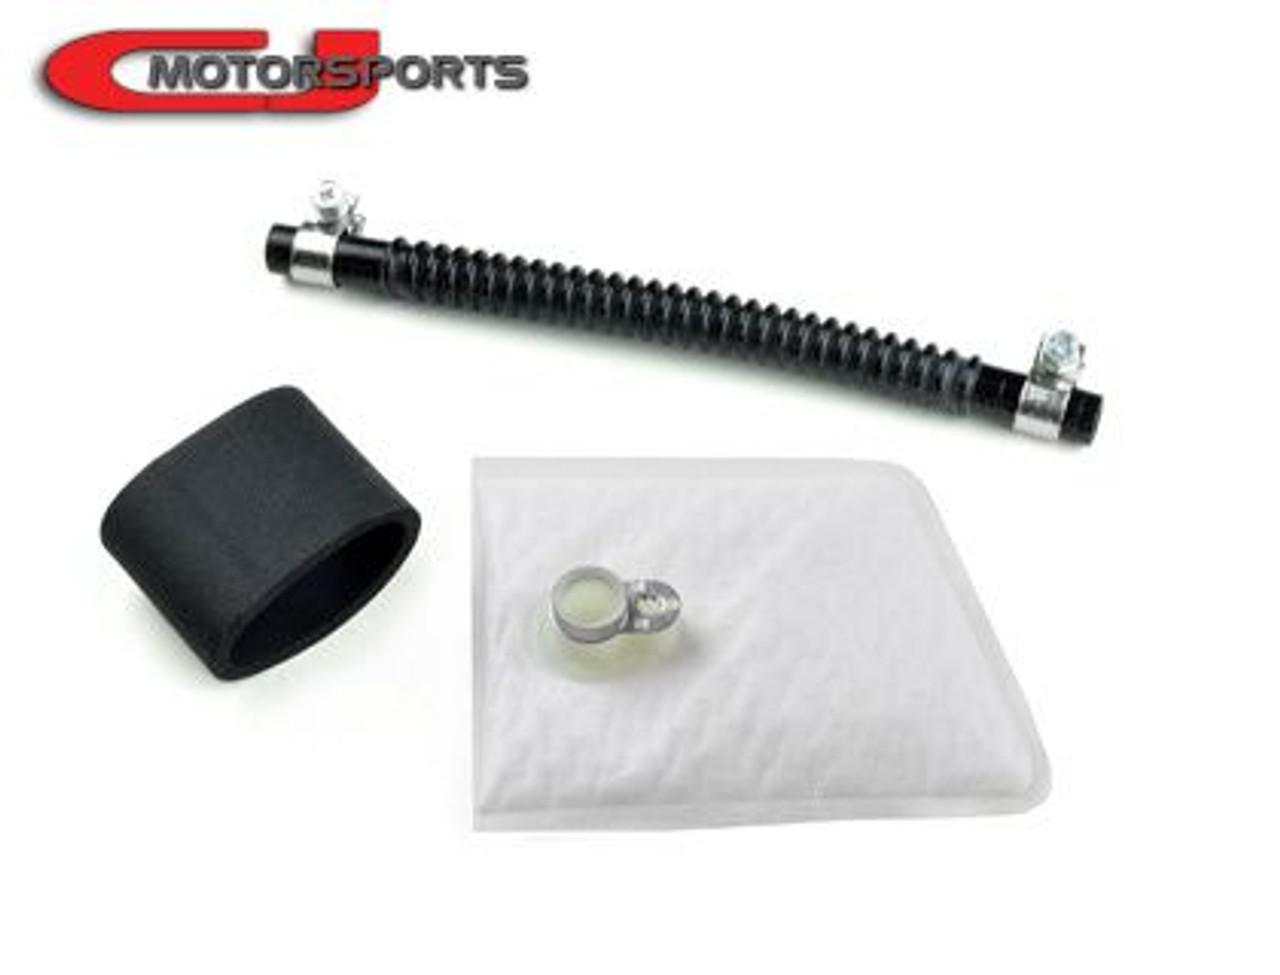 Fuel Pump Install Kit for 2009+ 370z/G37/Q50/Q60 VQ37VHR